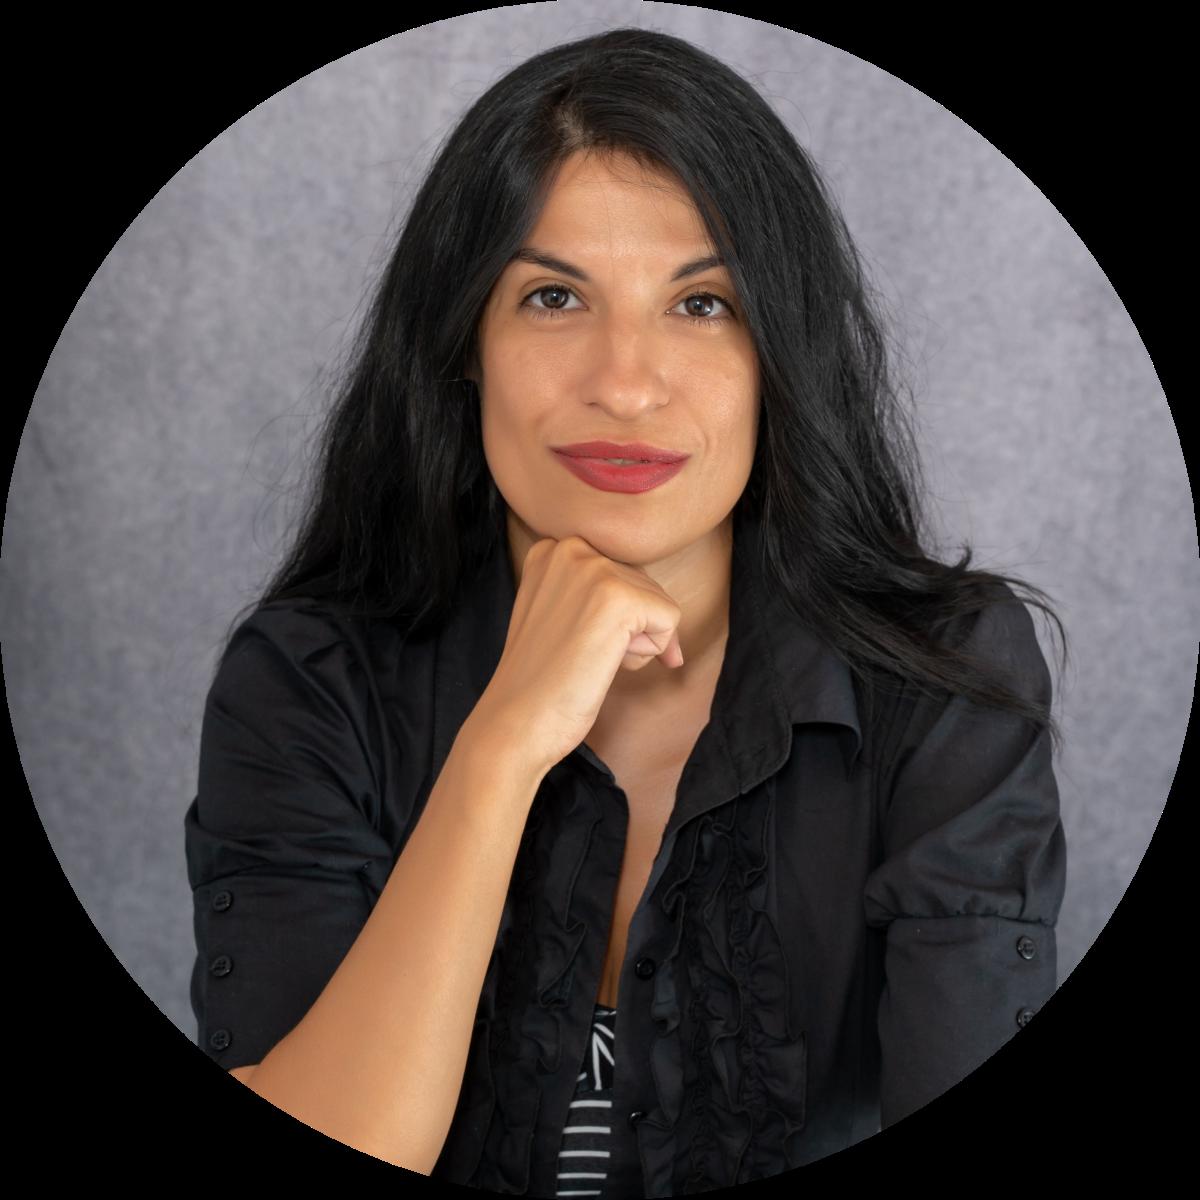 Corporate SEO Greece - SEO Services Expert - Joanna Vaiou